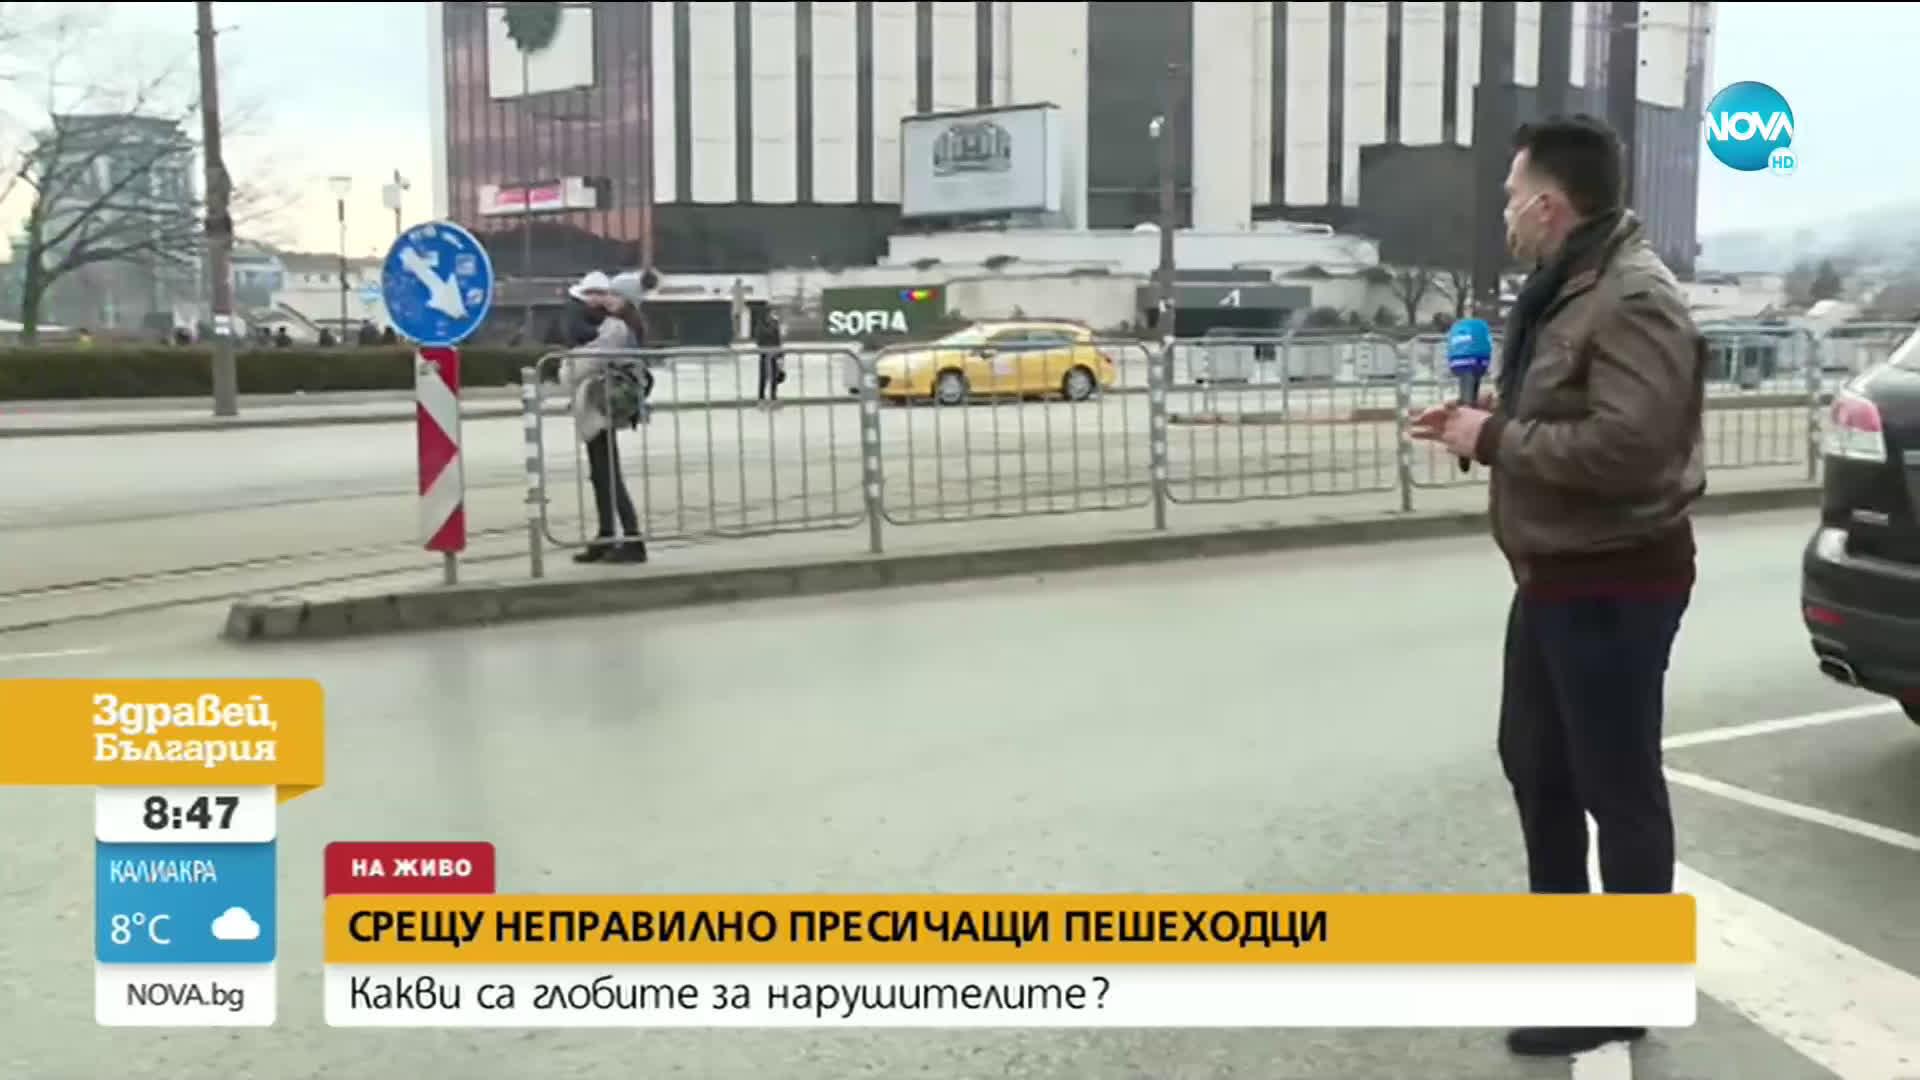 Провеждат акция срещу неправилно пресичащи в София